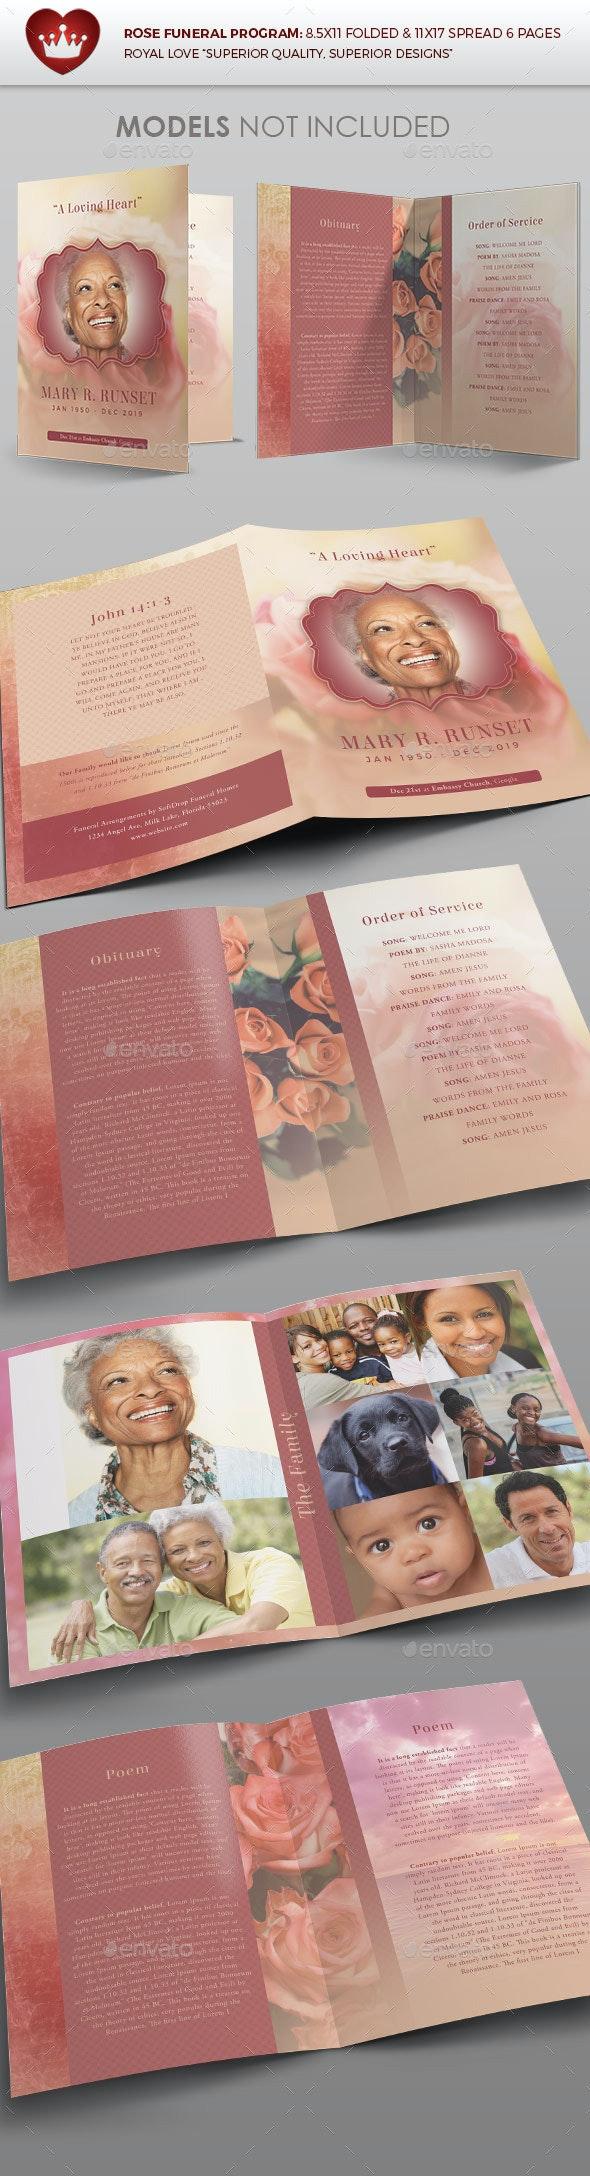 Rose Funeral Program Template - Brochures Print Templates